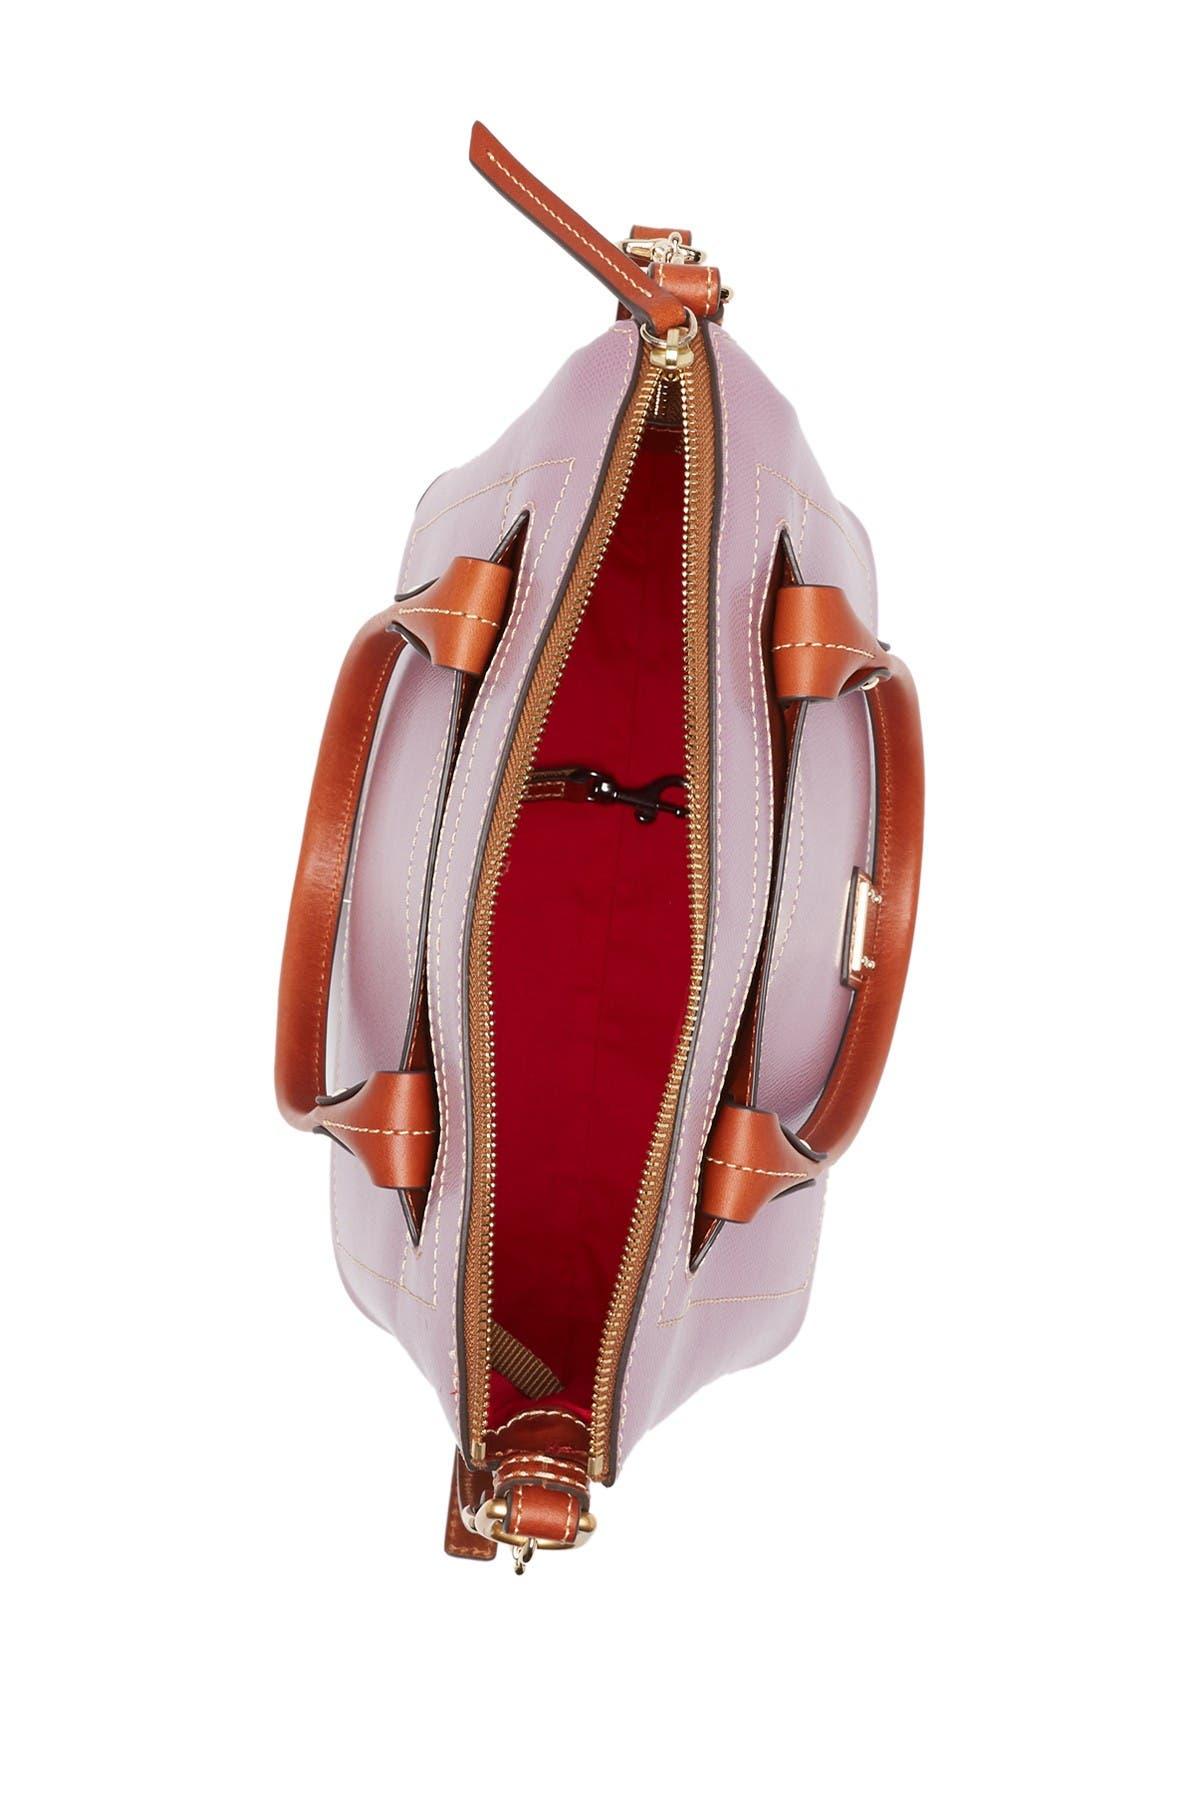 Image of Dooney & Bourke Domed Leather Satchel